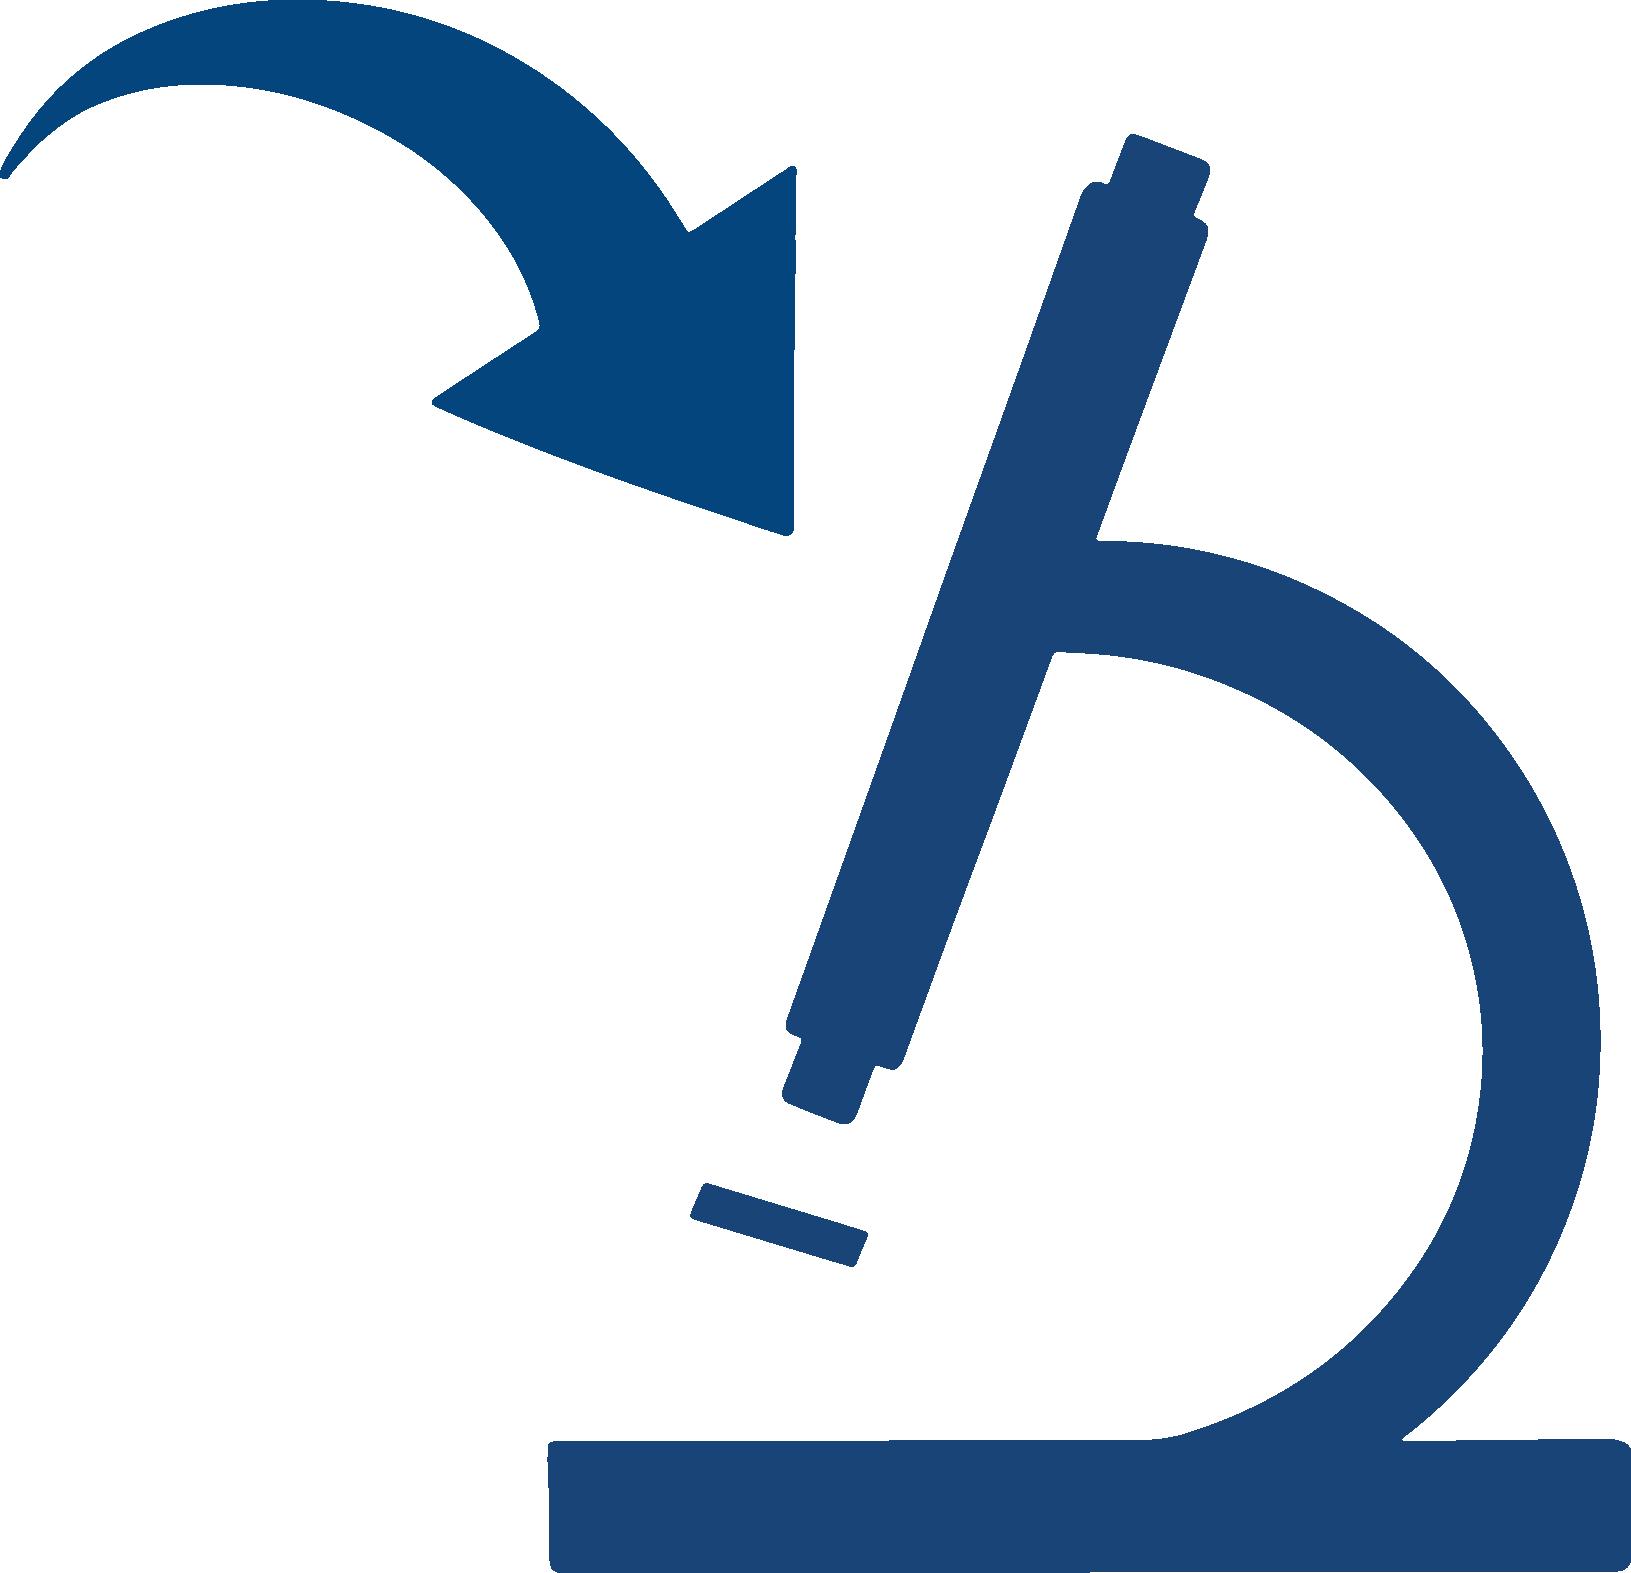 Research purposes icon